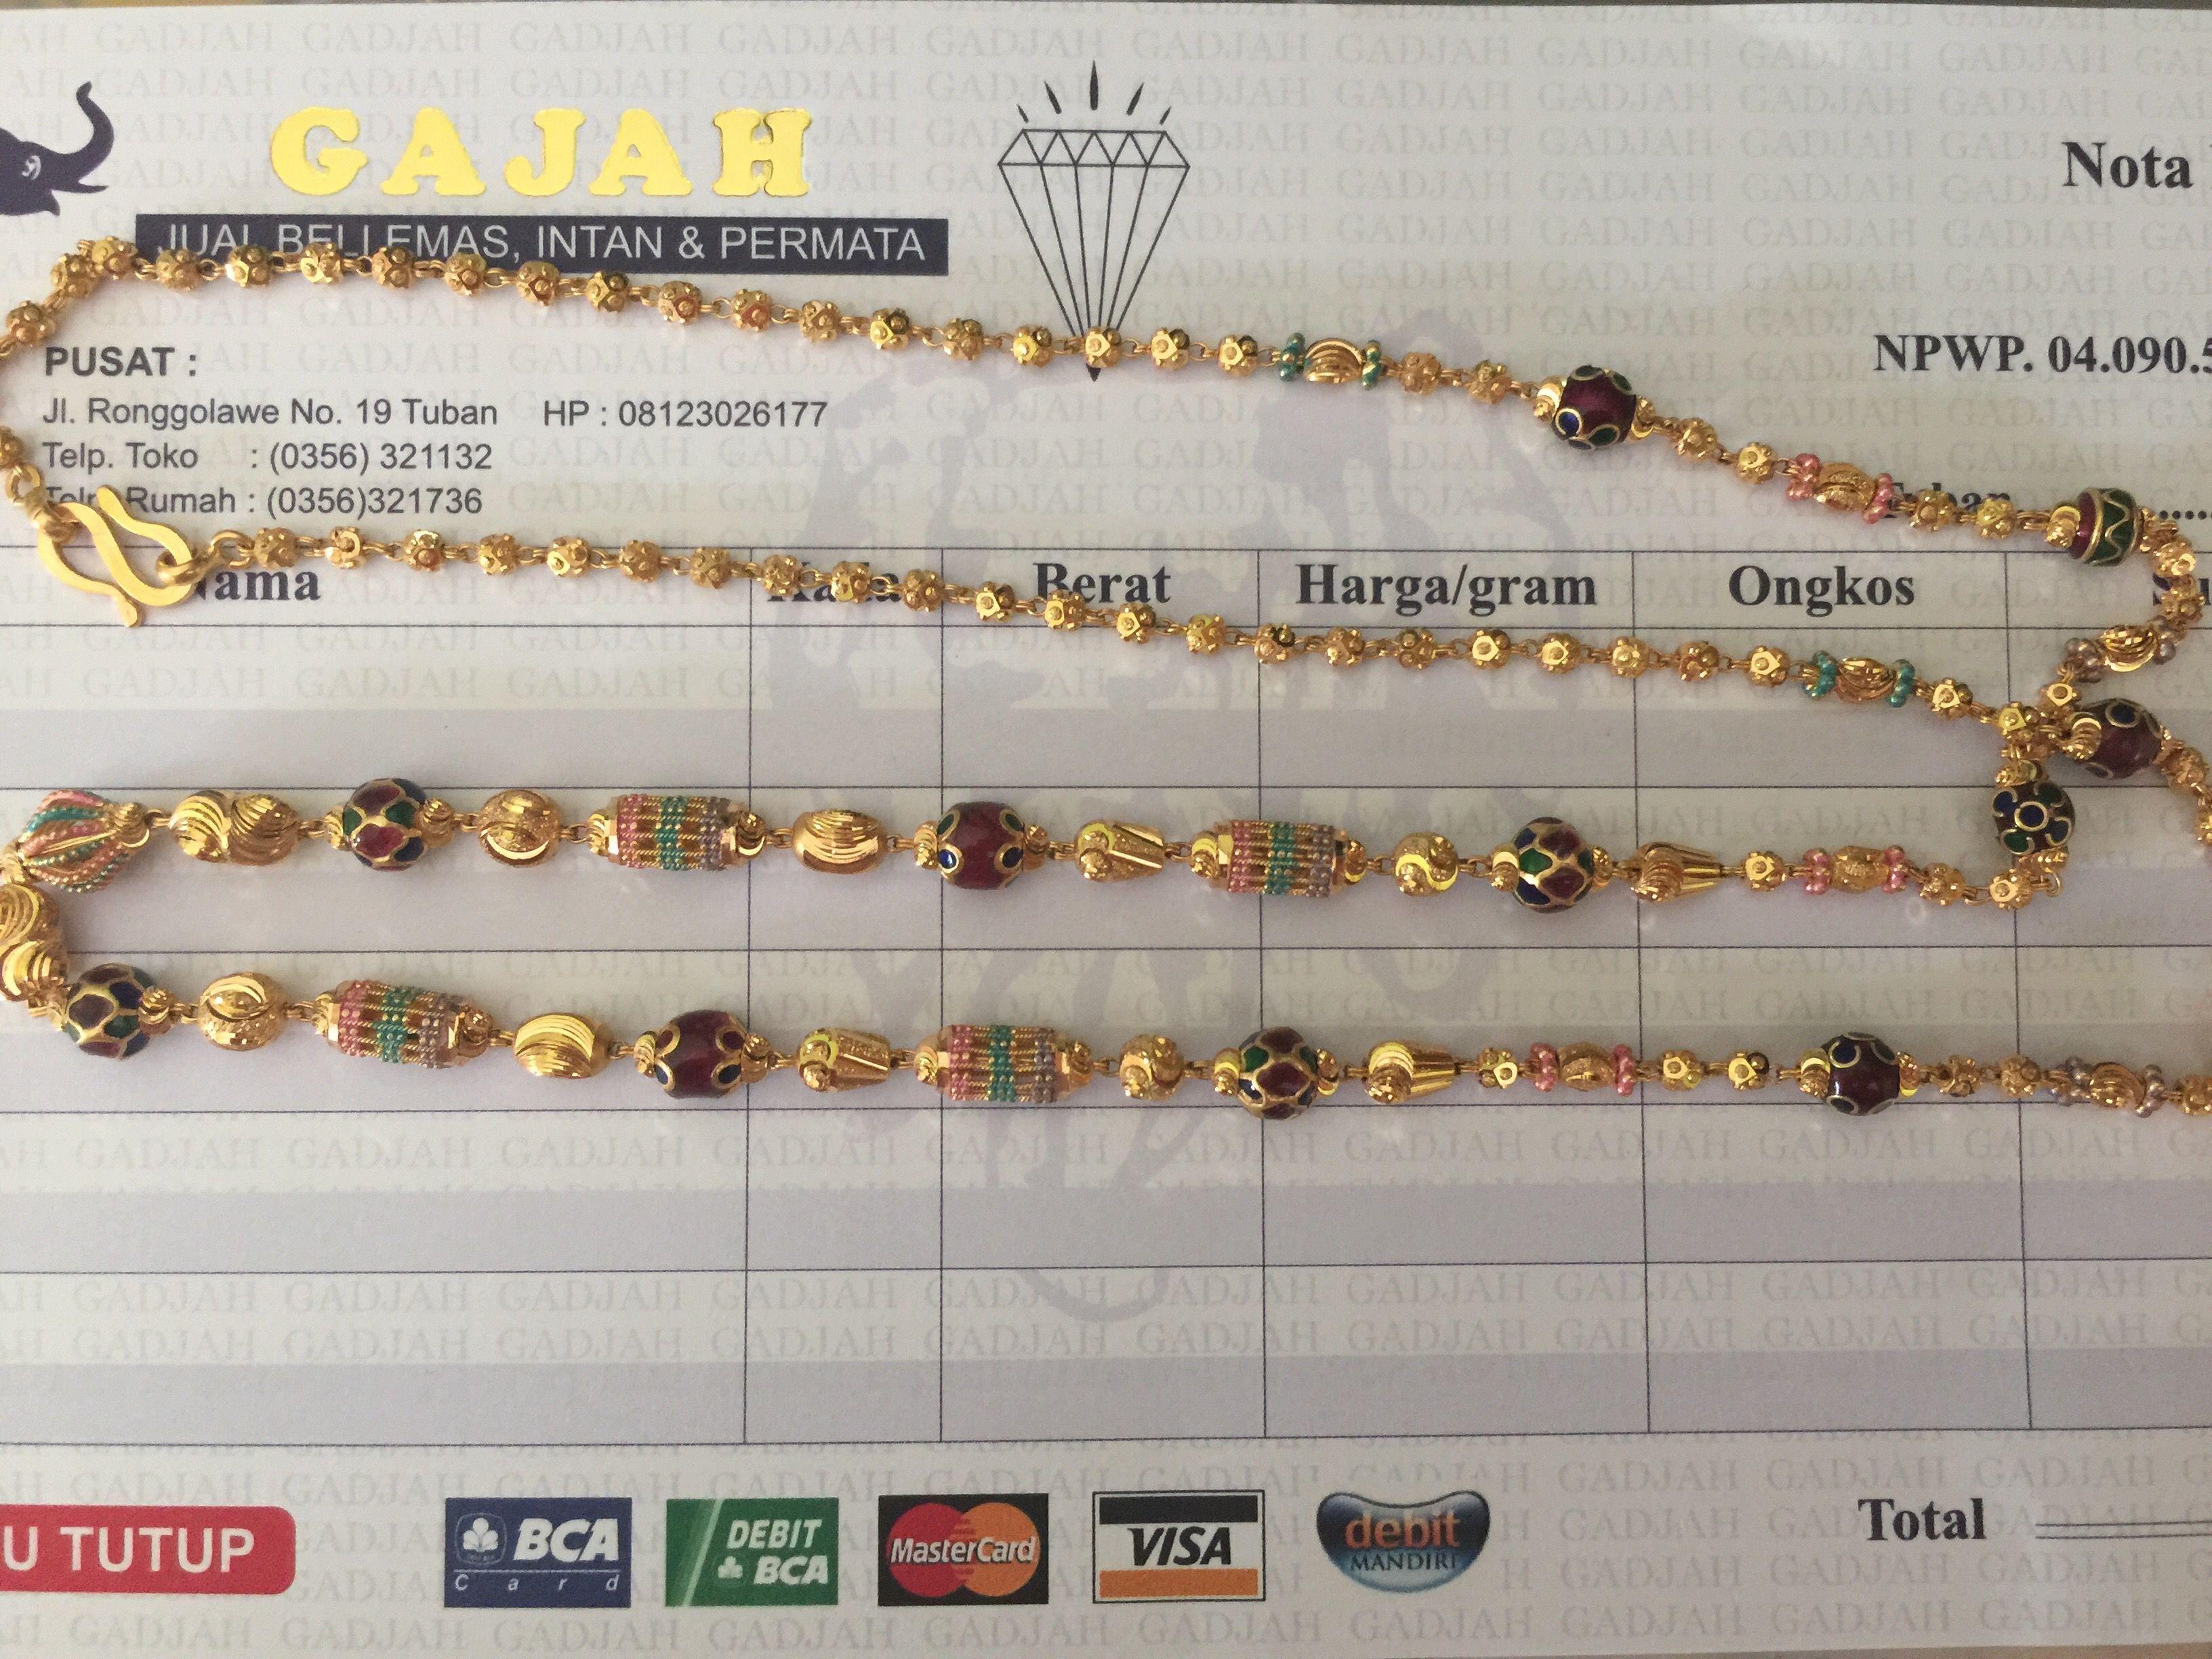 22k Gold India Dubai Ornament Necklace 70cm Necklace70cm Pandora Jewelry Box Pandora Jewelry Necklace Diy Jewelry Necklace